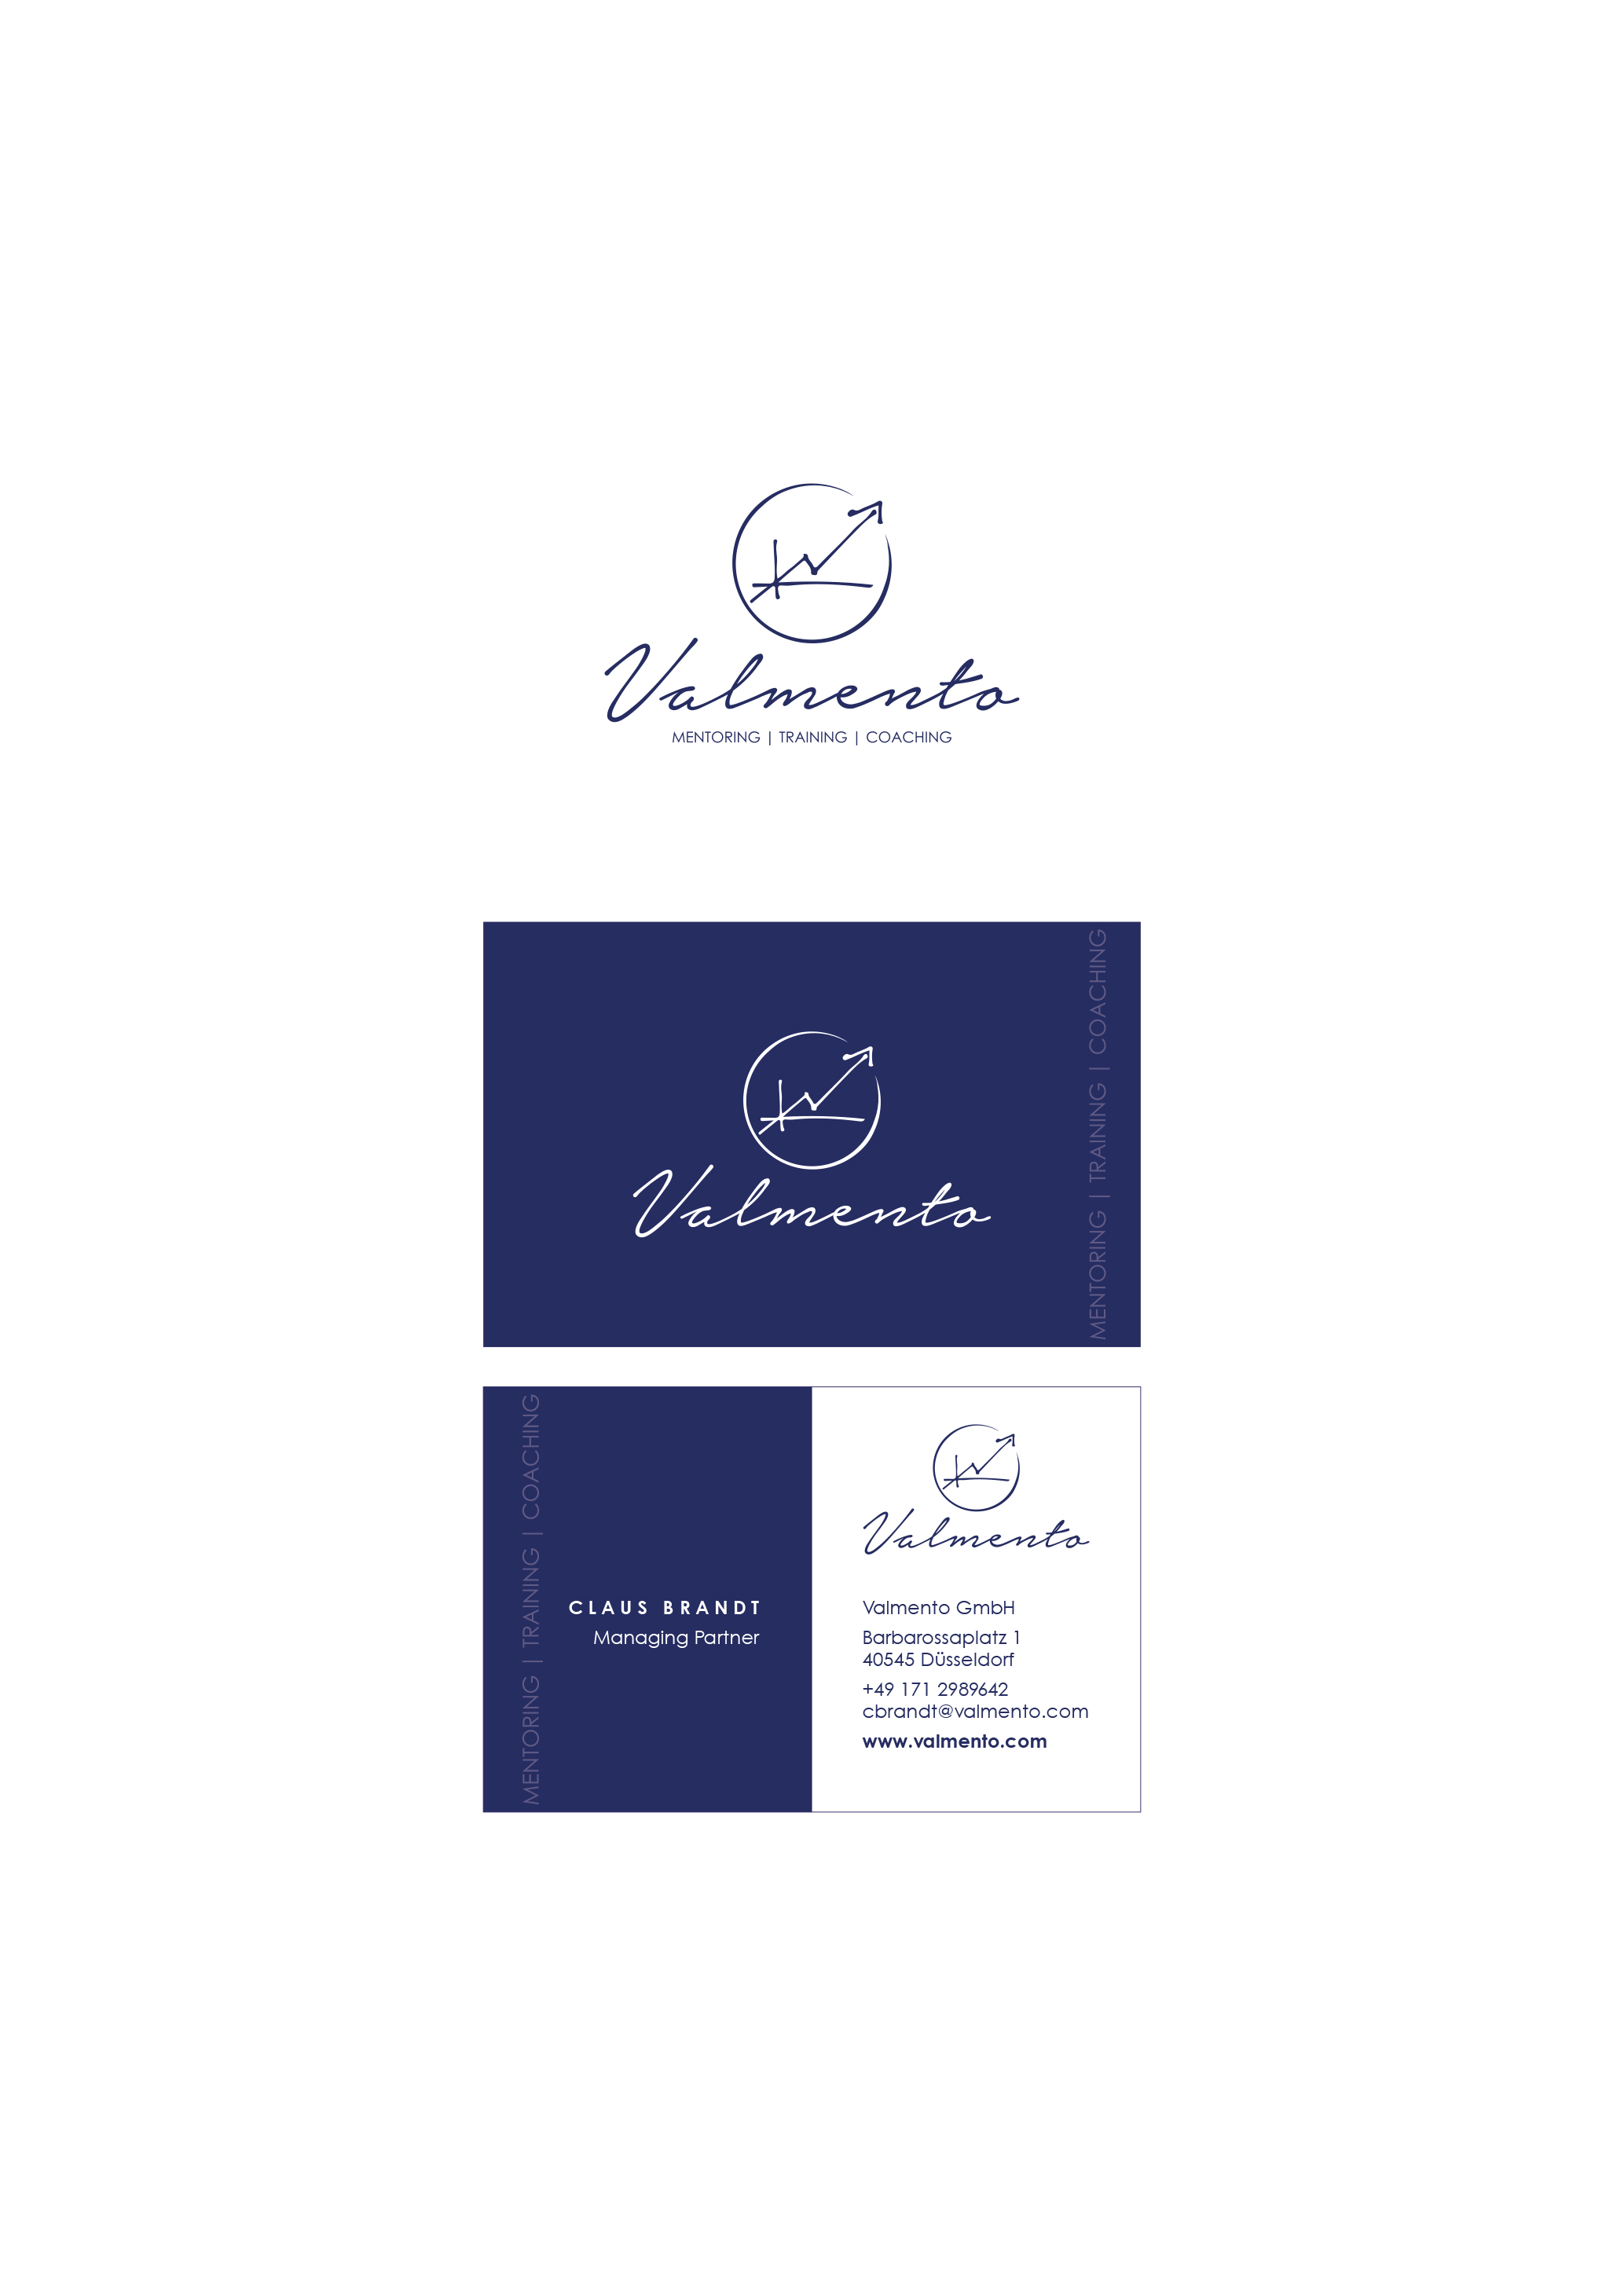 Elegantes Logo Visitenkarte Für Unternehme Logo